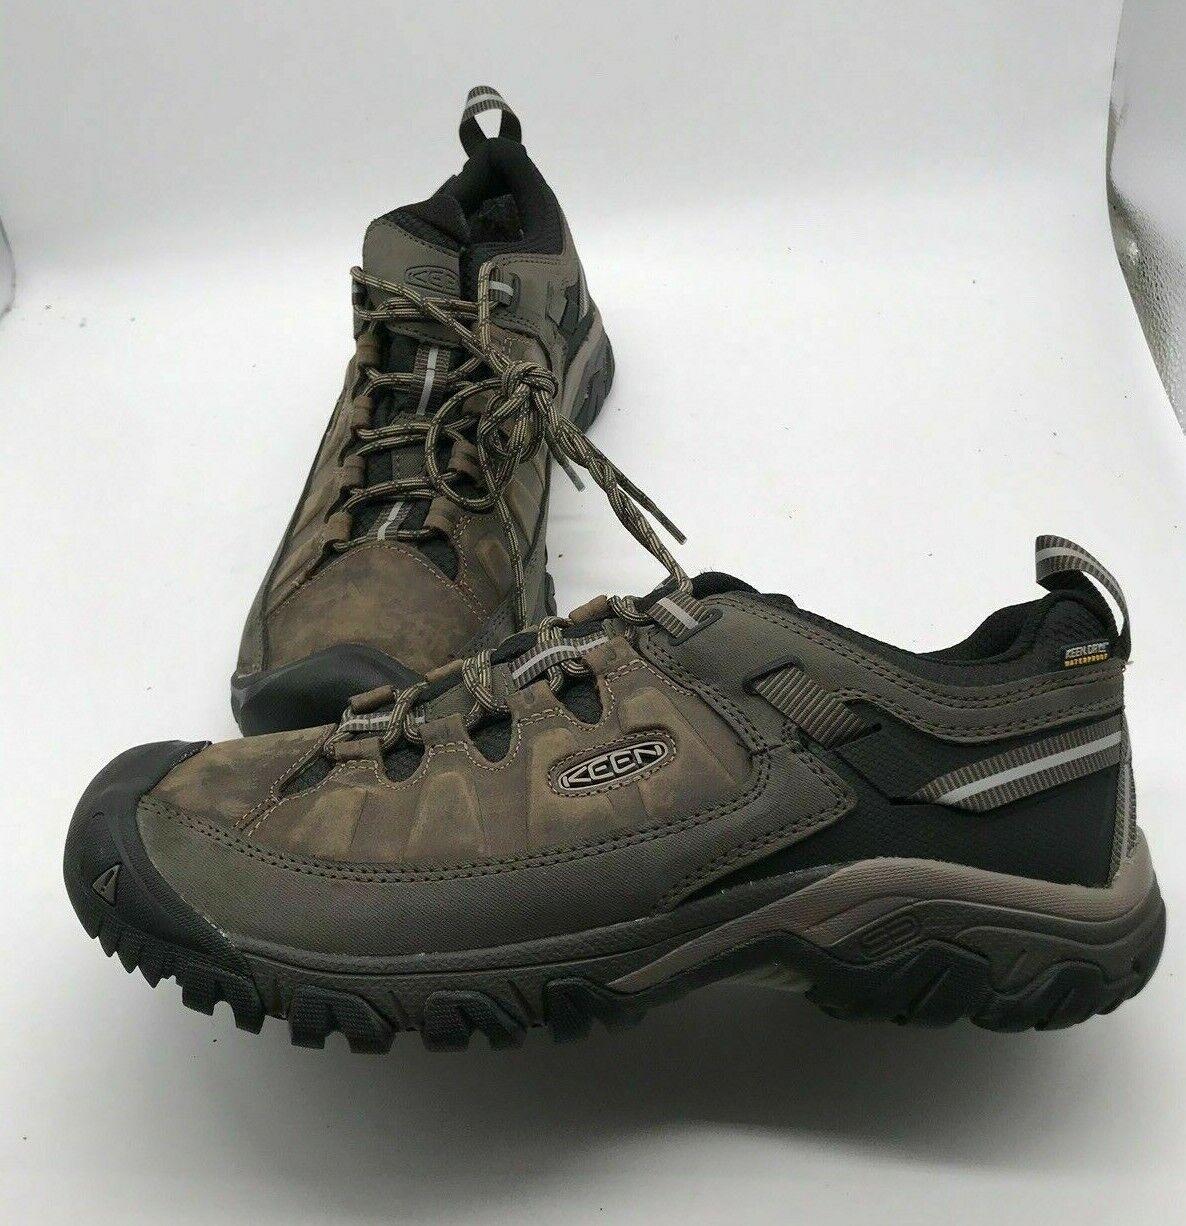 KEEN Outdoor 1017783 Men's Targhee III Waterproof stivali Leather Hiking scarpe